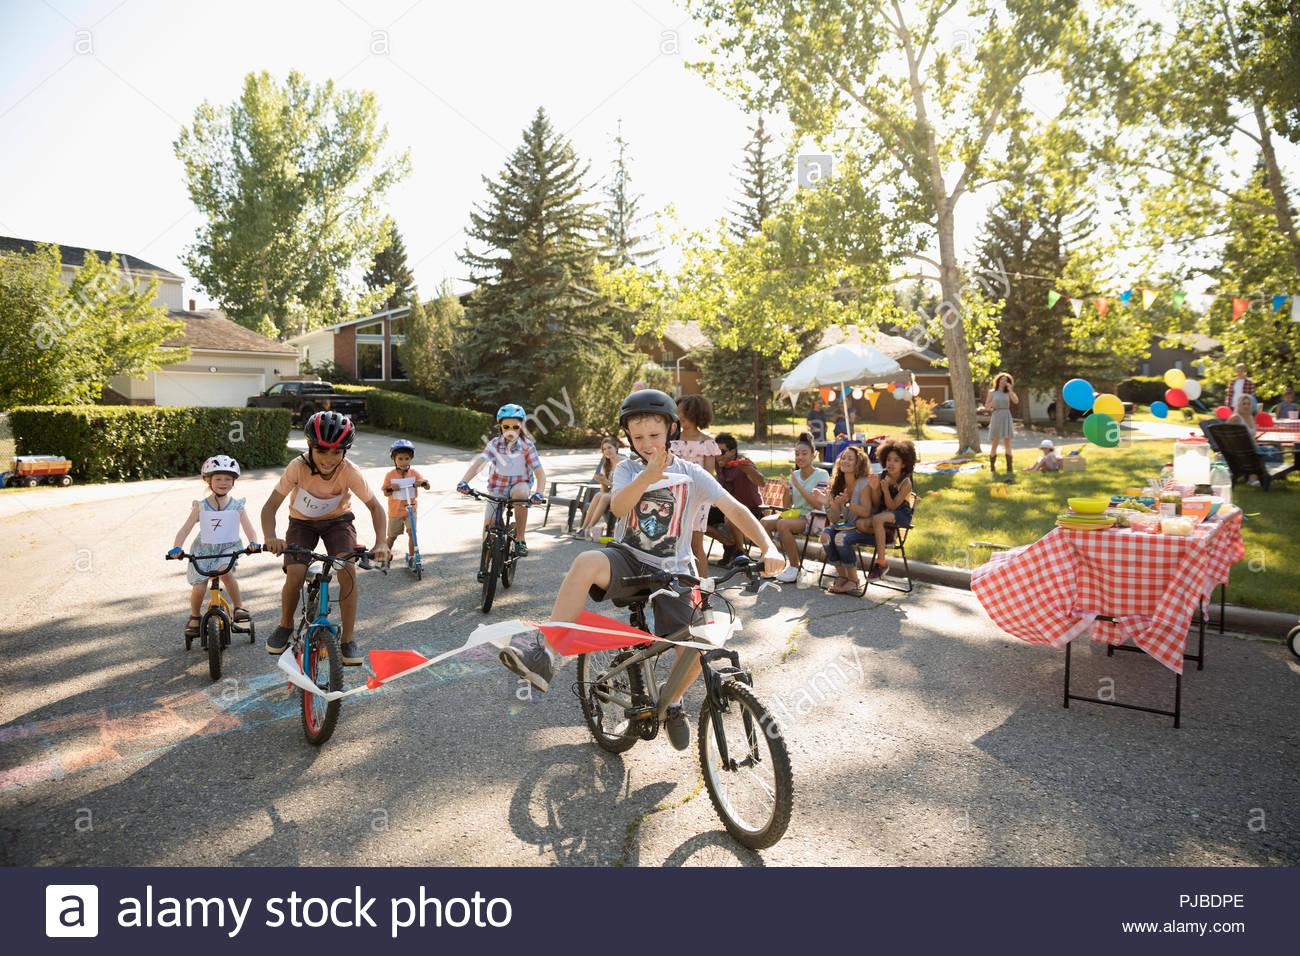 Kids enjoying bike race at summer neighborhood block party - Stock Image